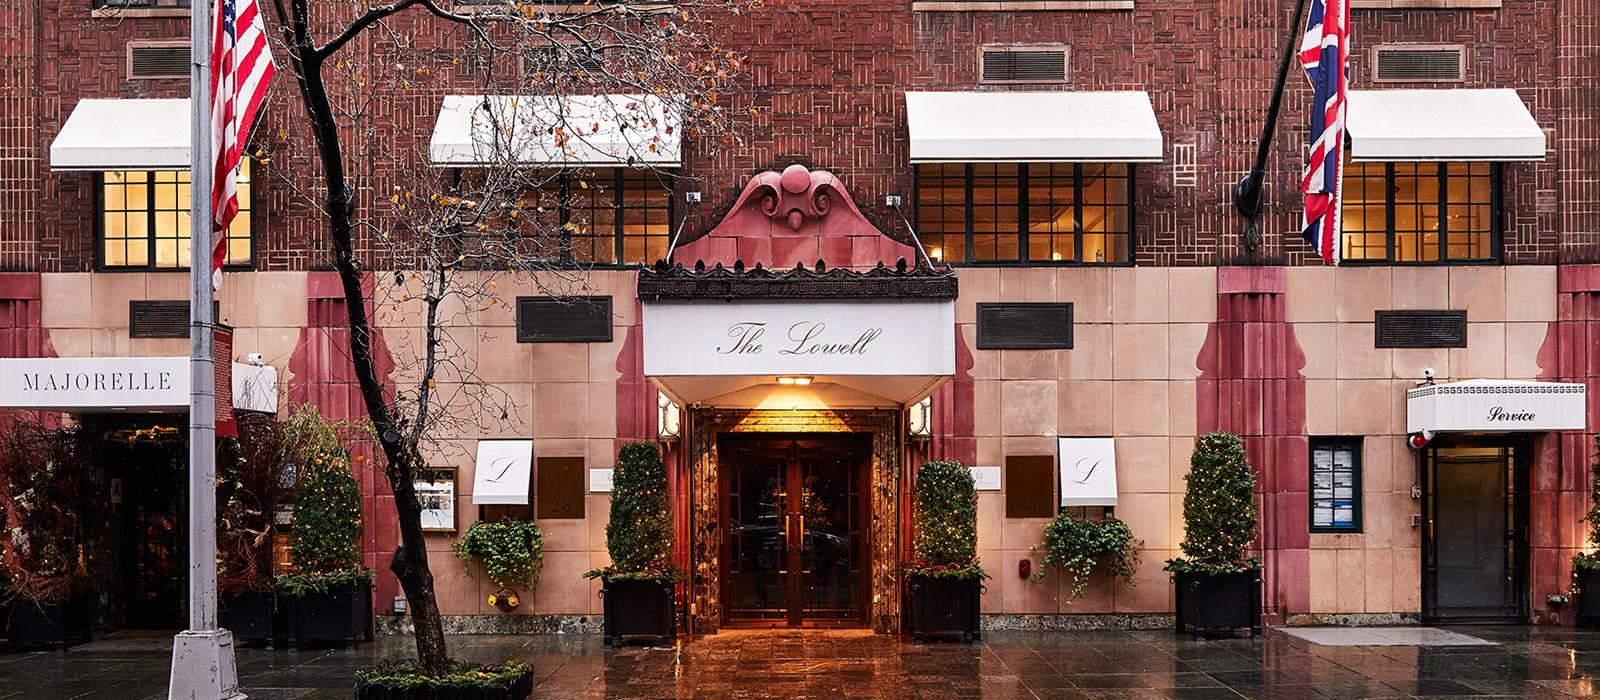 2019 12 11 Lowell Hotel 0008 ©NicoSchinco Web 3 - The Lowell